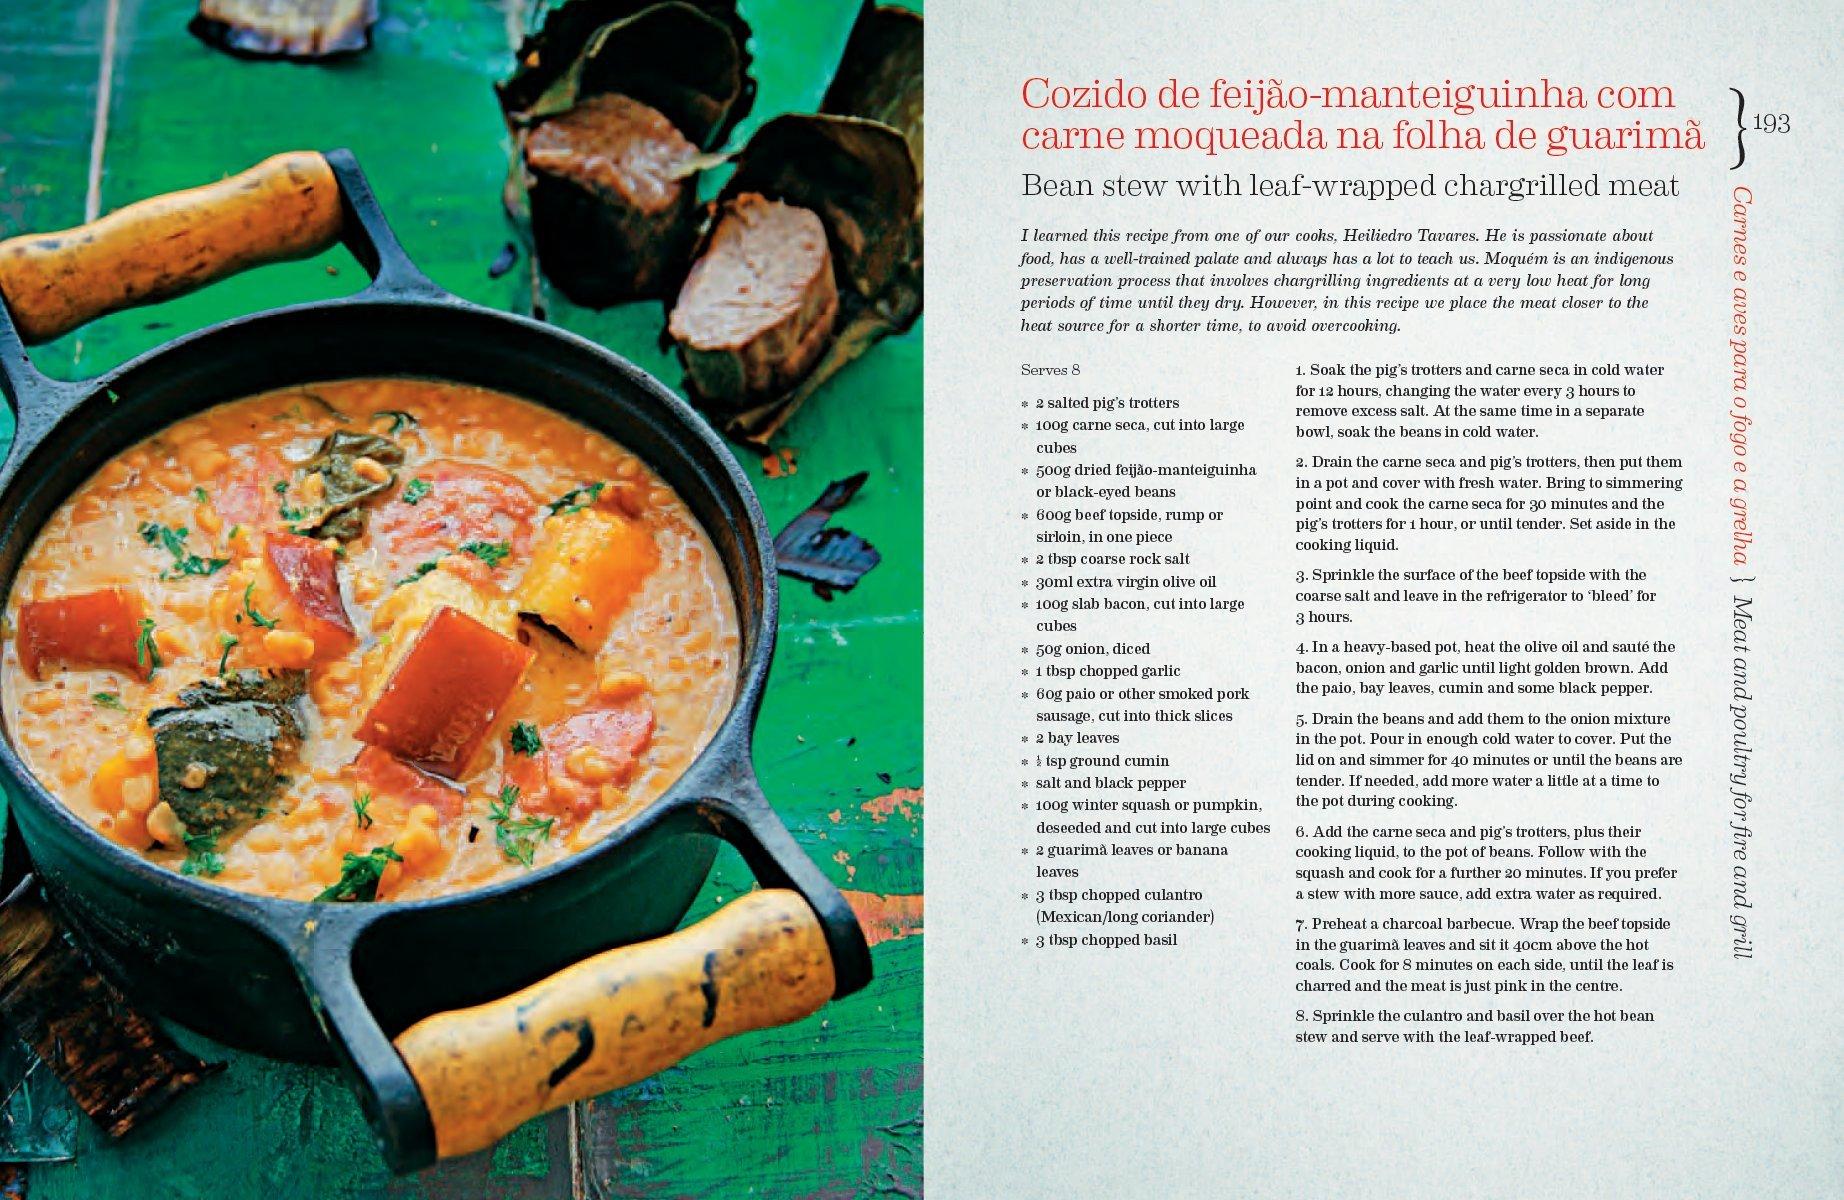 Brazilian food thiago castanho luciana bianchi 9781770854727 brazilian food thiago castanho luciana bianchi 9781770854727 amazon books forumfinder Image collections